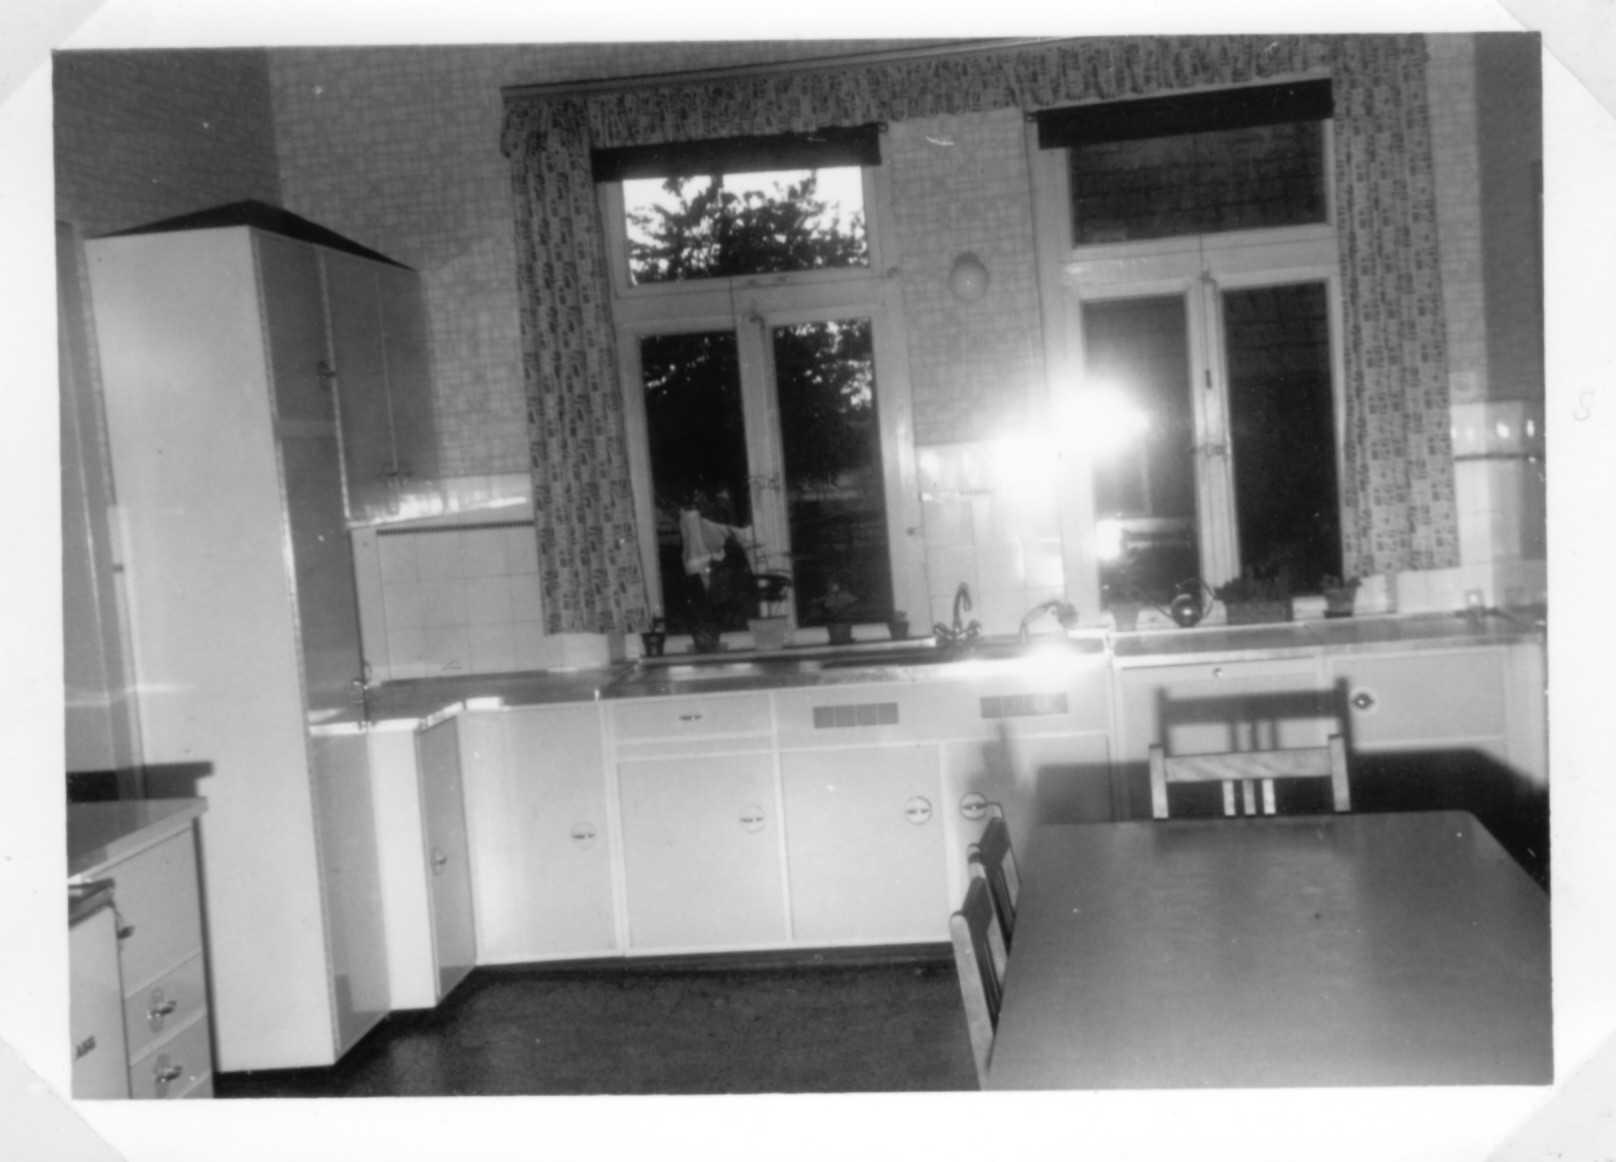 brinkmann wide web hofarchiv 1961 betriebsbeschreibung. Black Bedroom Furniture Sets. Home Design Ideas